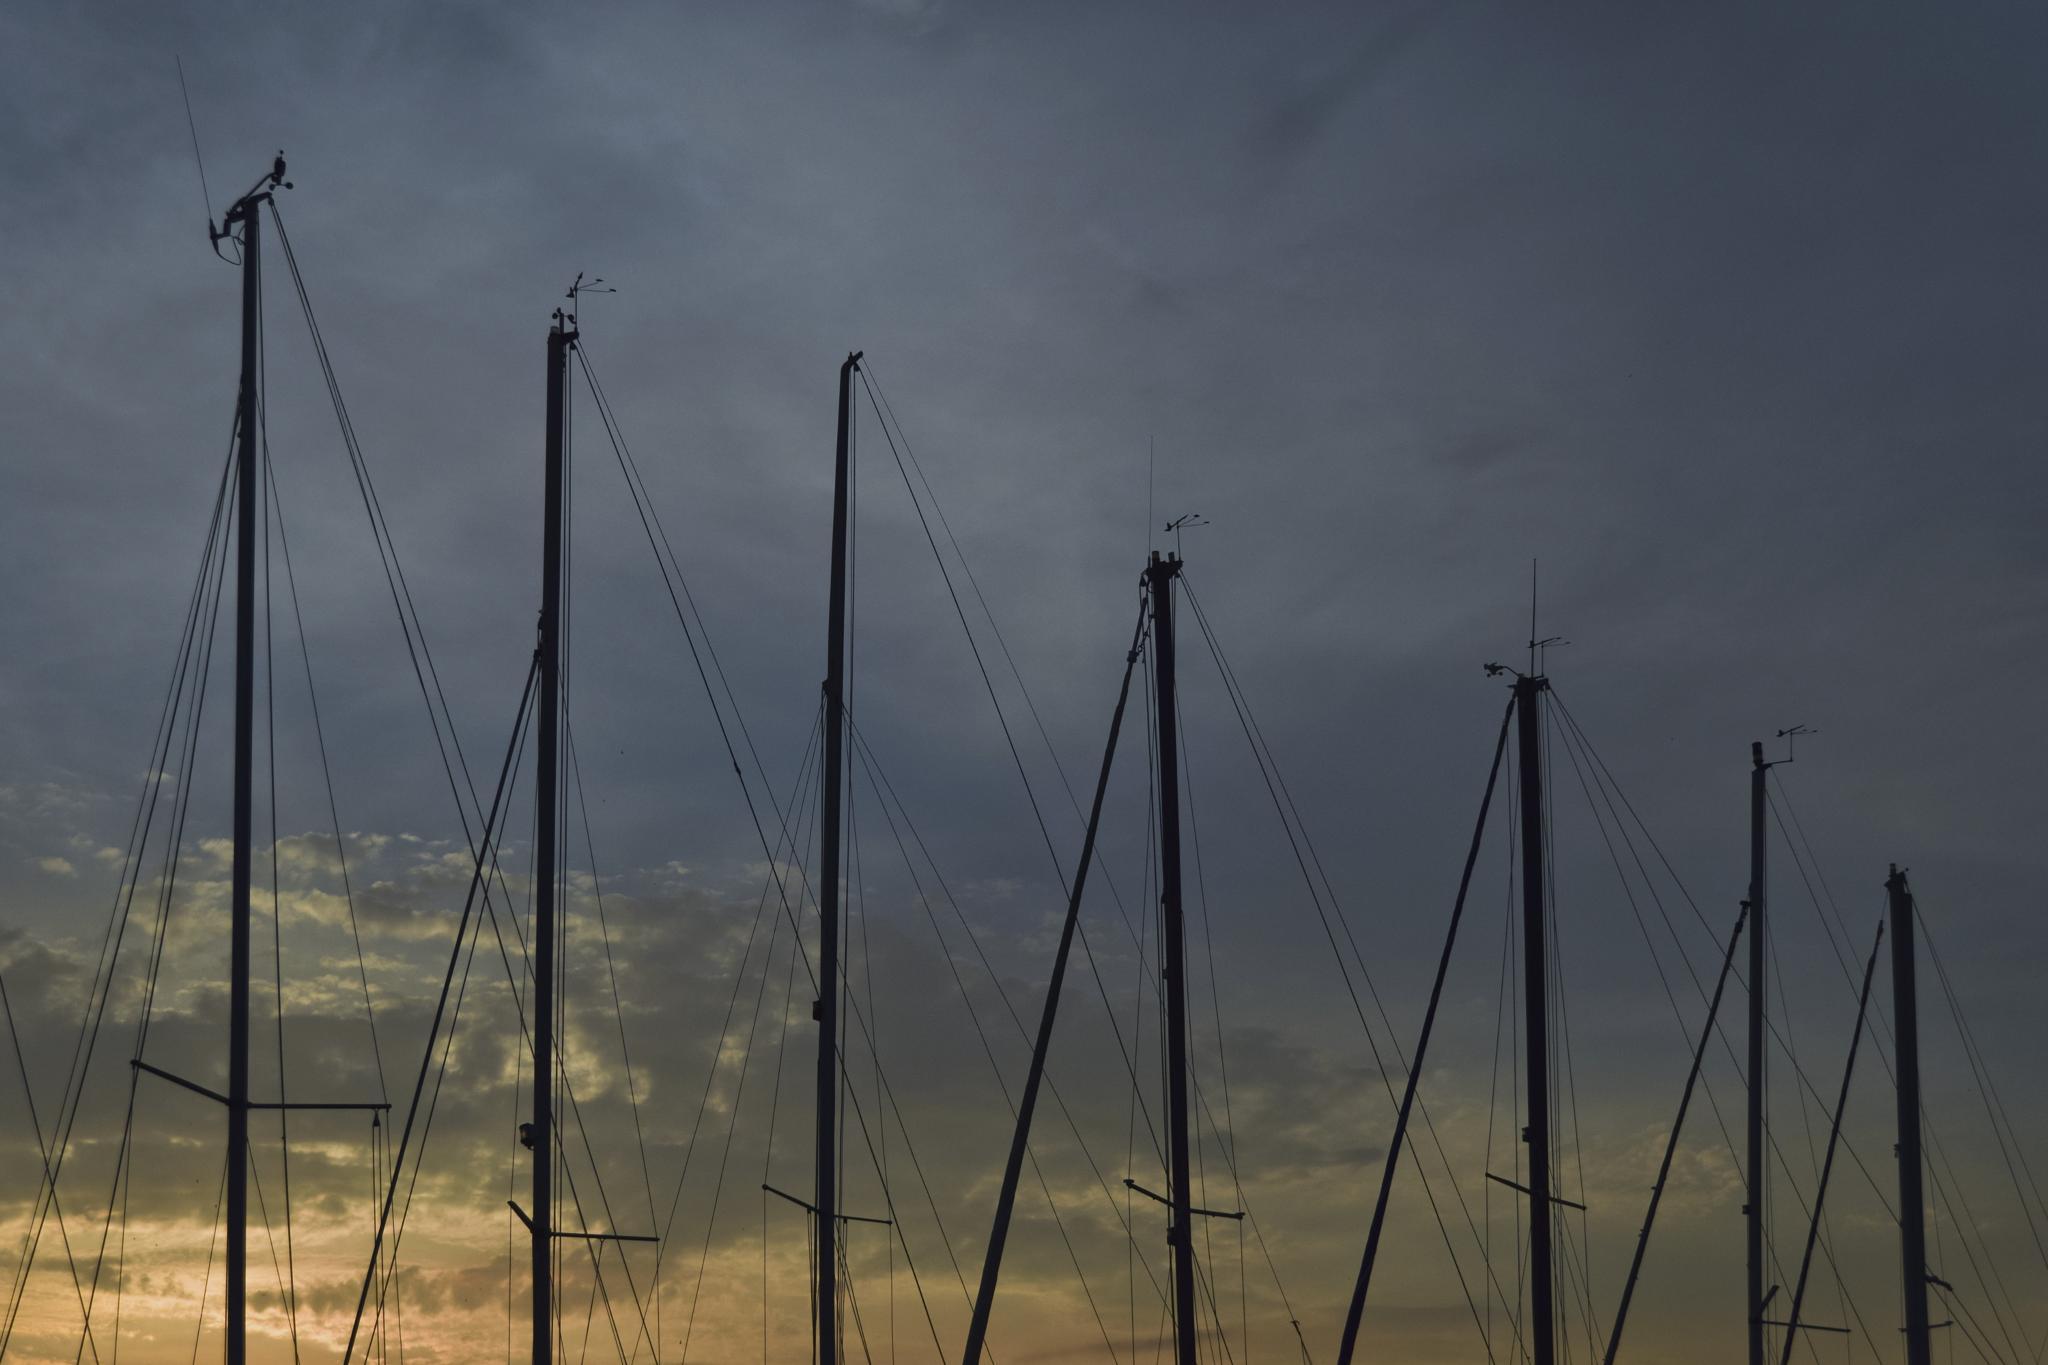 Untitled by Fabio Ernesto Francesco Magni